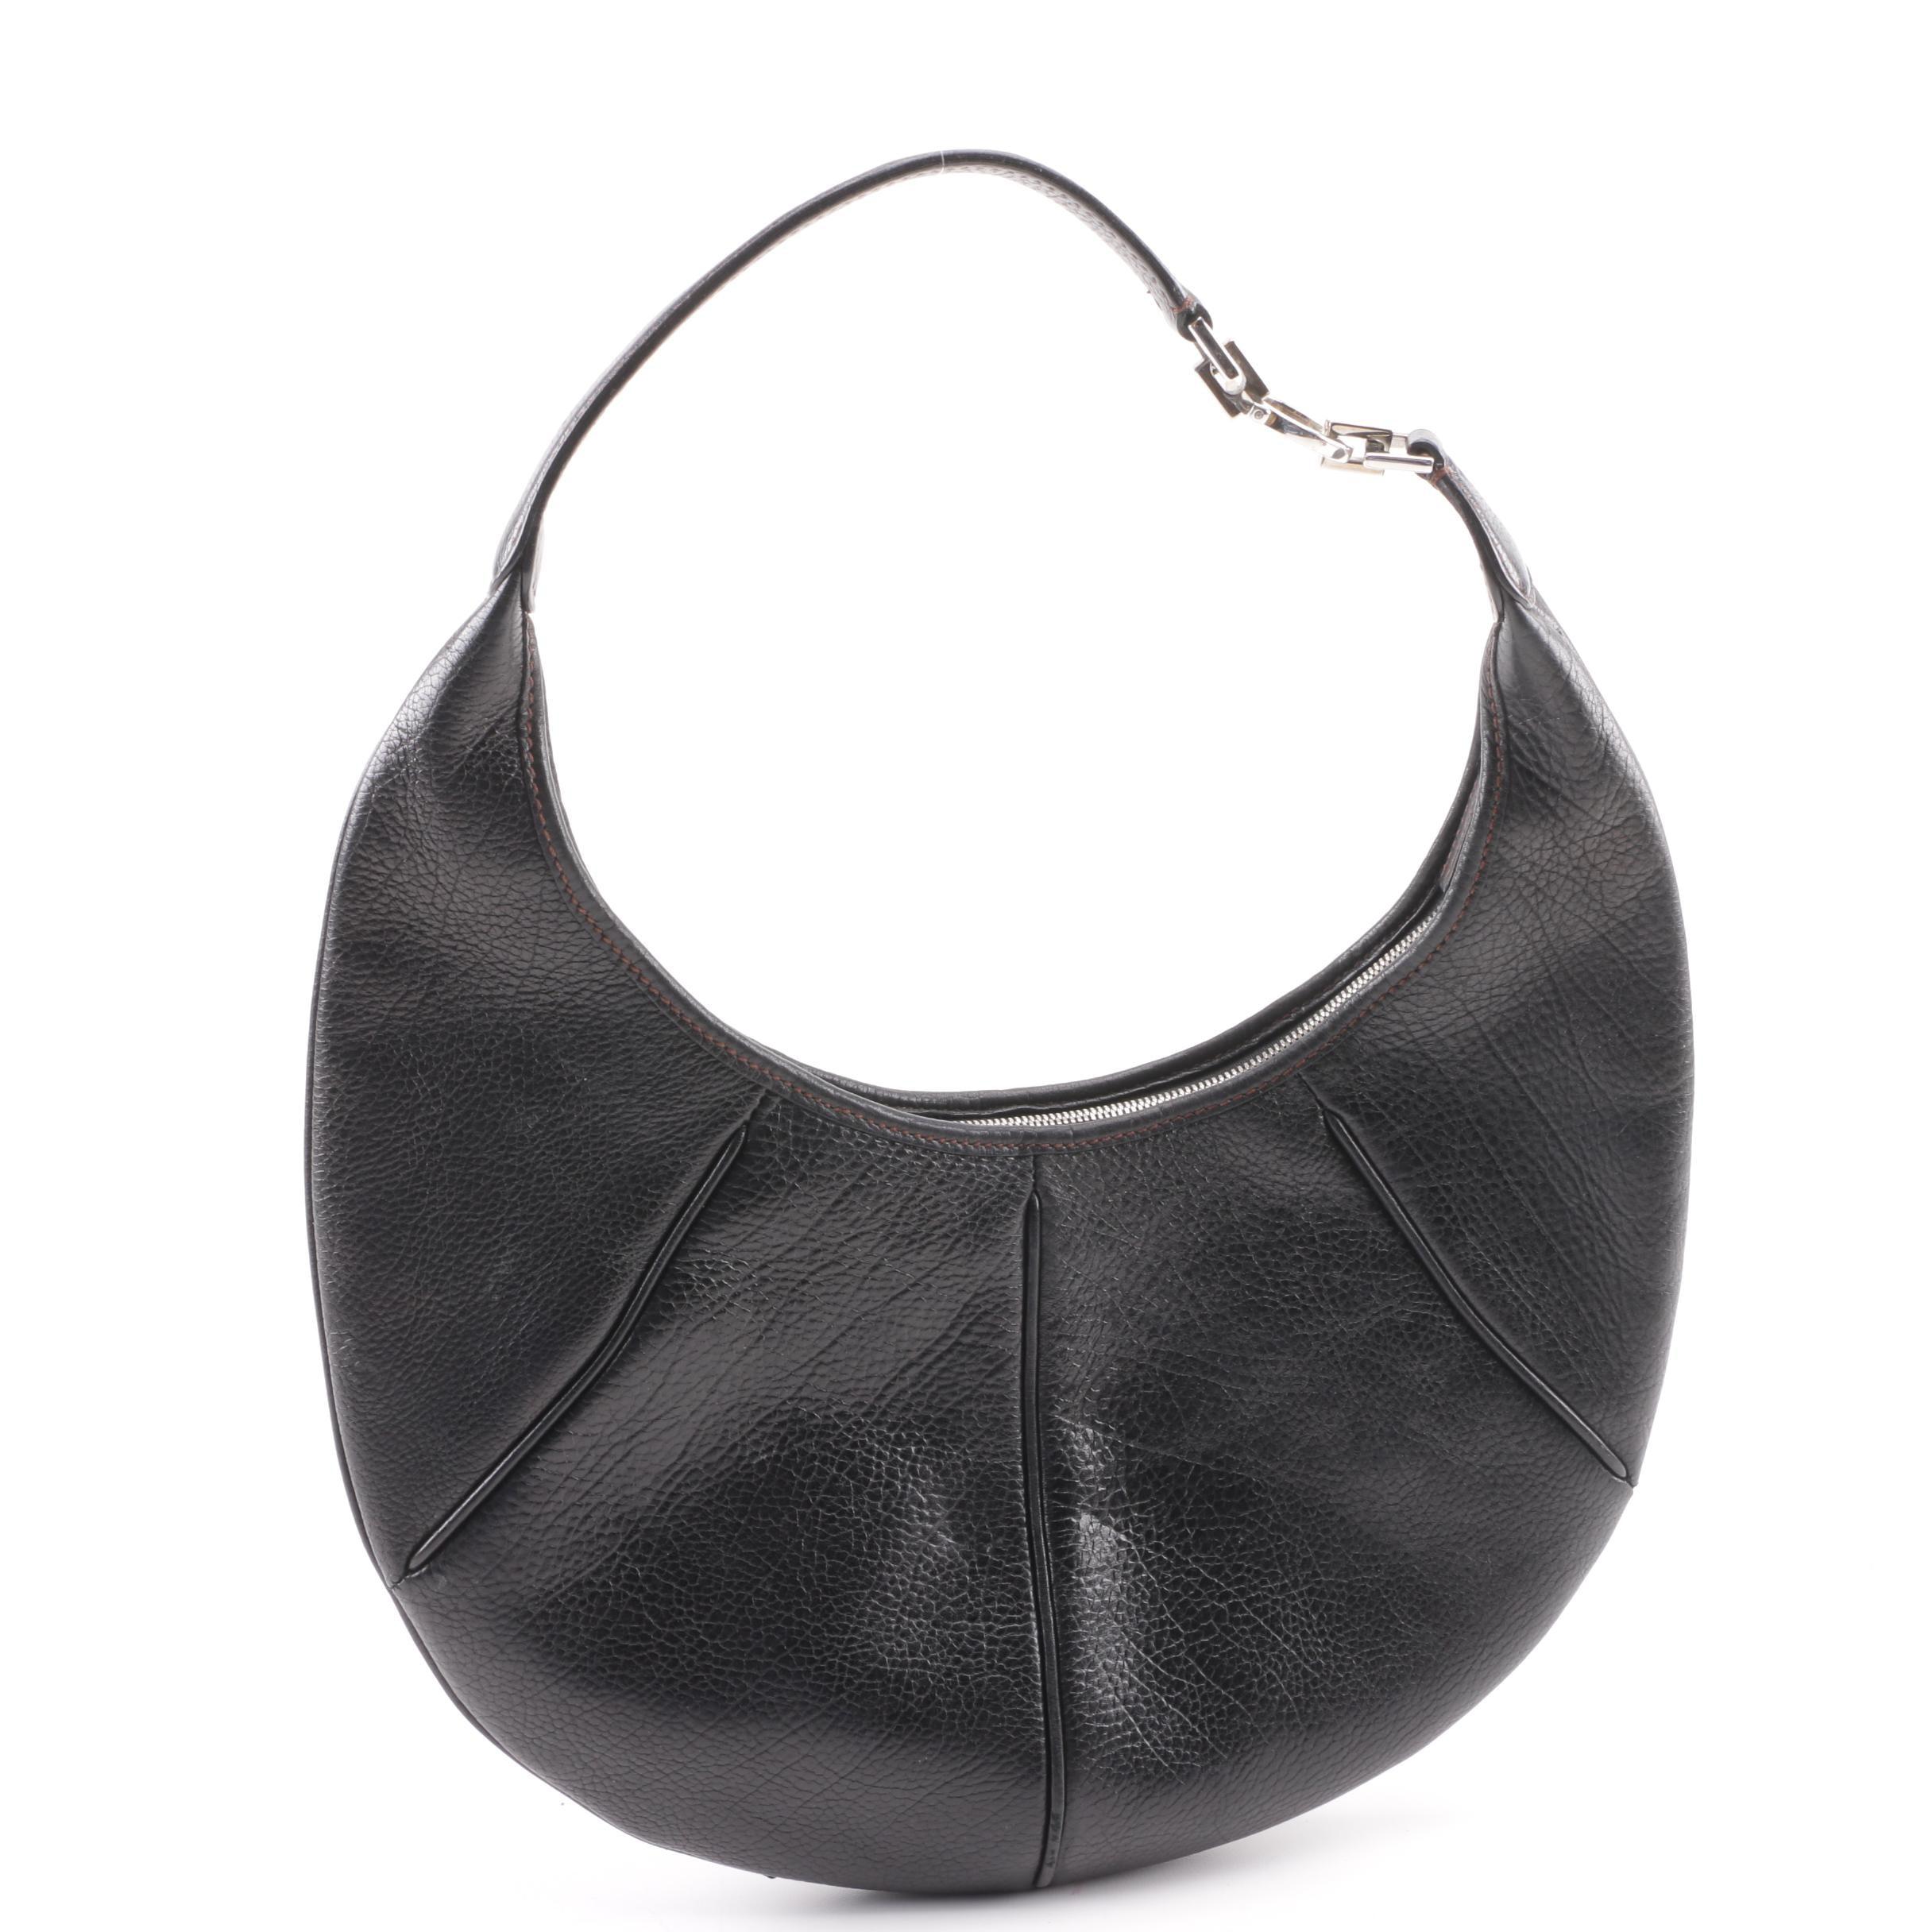 Salvatore Ferragamo Black Pebbled Leather Hobo Bag